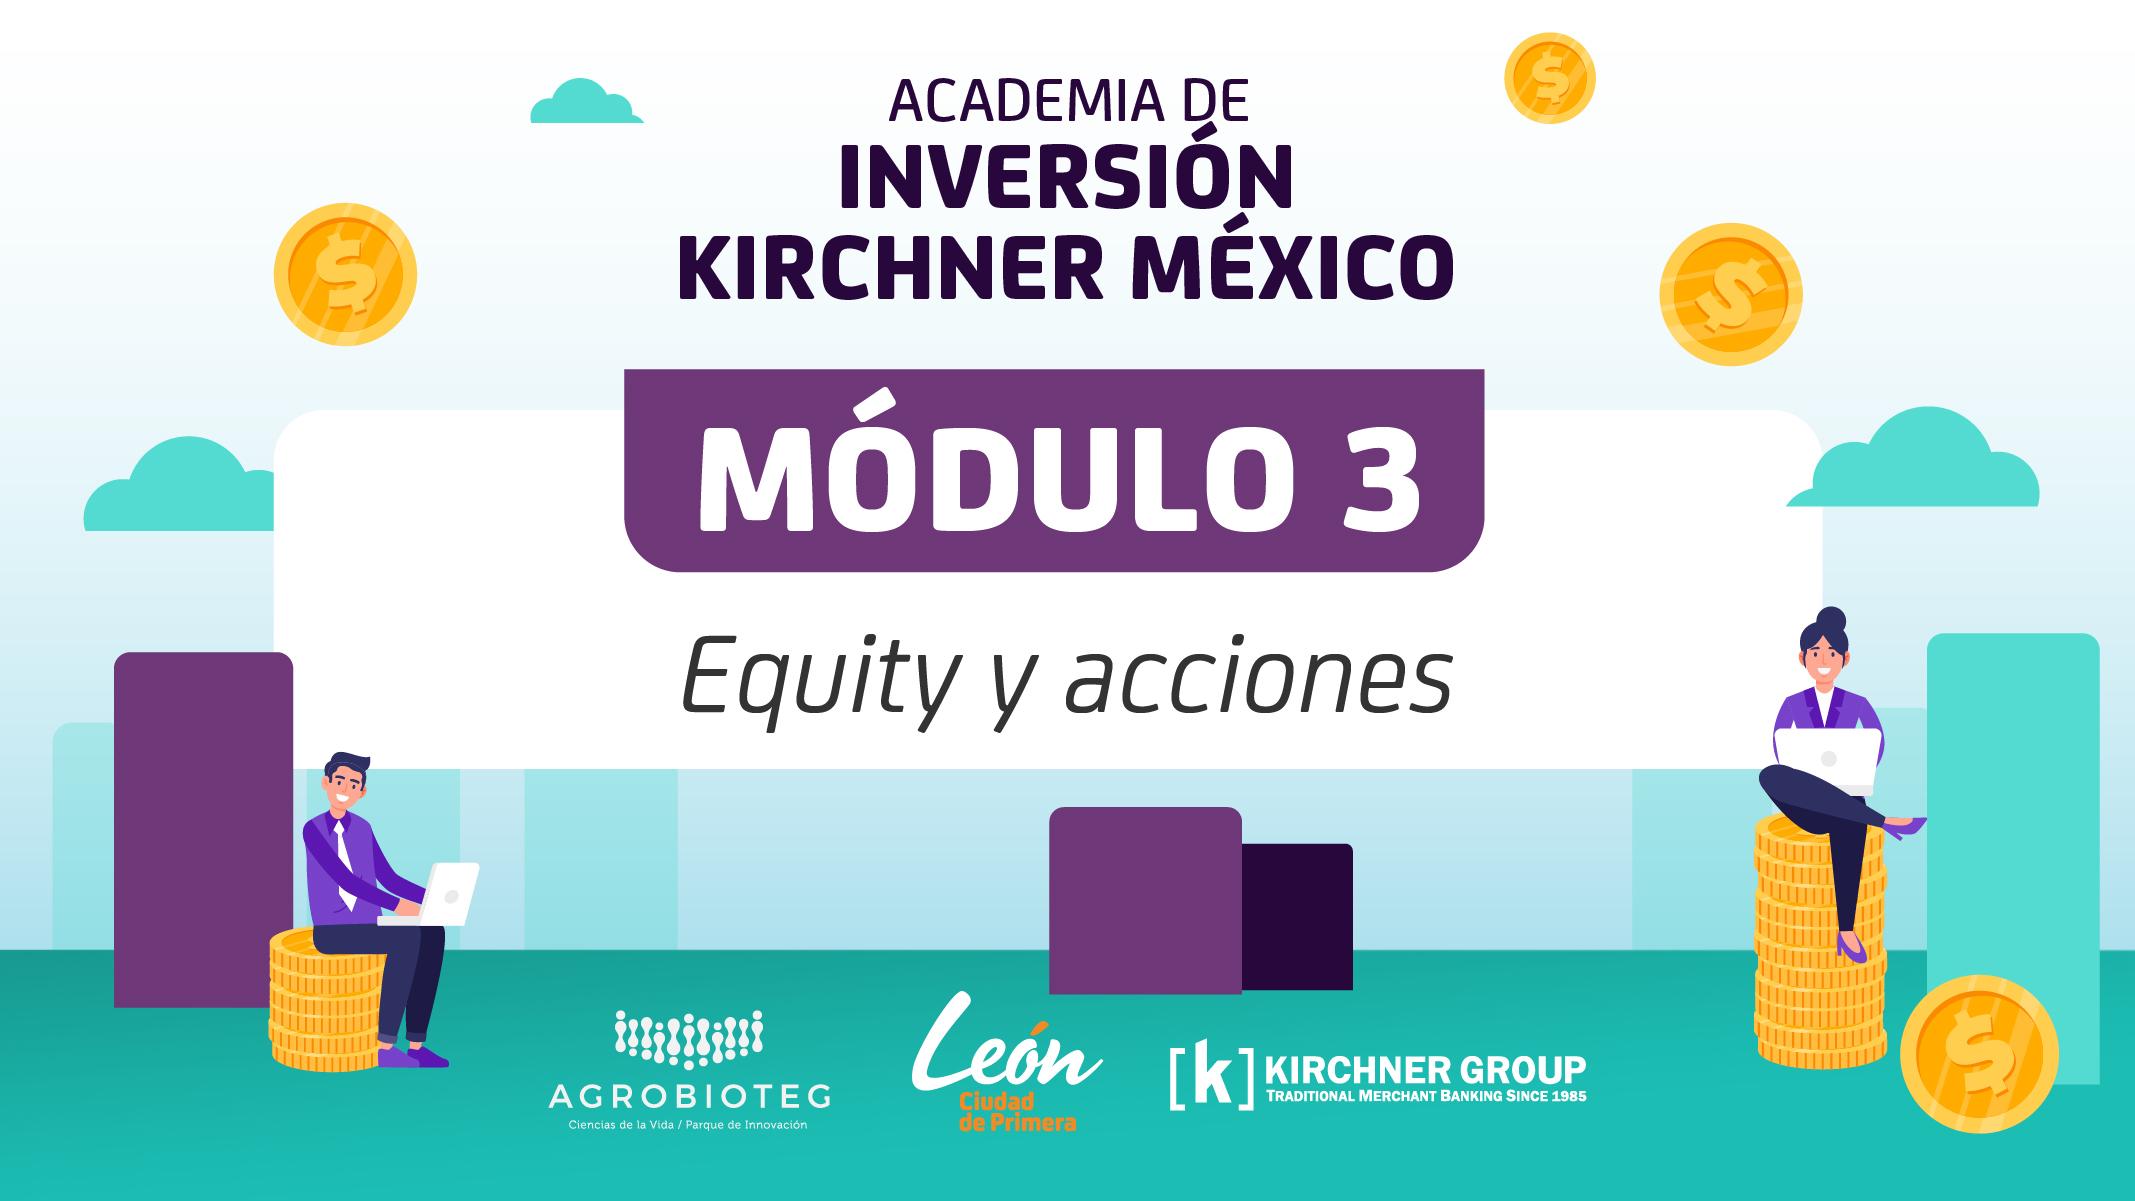 ACADEMIA DE INVERSION_MODULO3